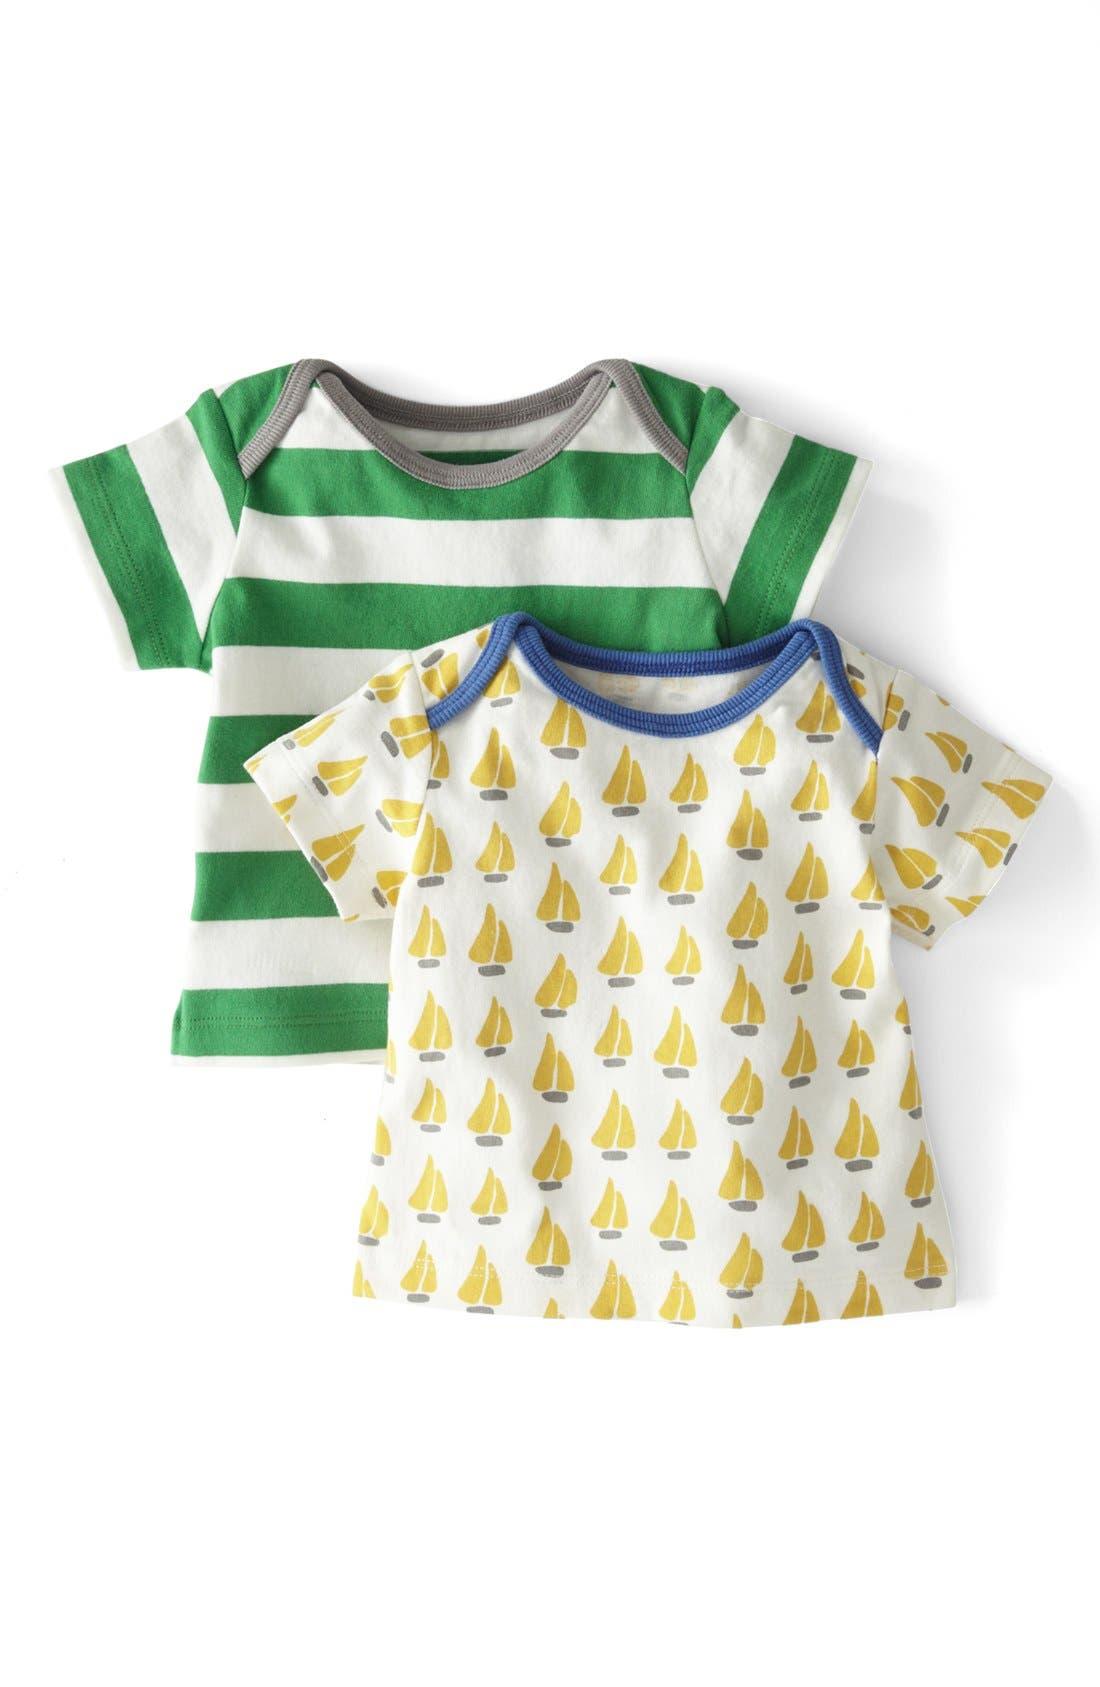 Alternate Image 1 Selected - Mini Boden 'Nautical' T-Shirt (2-Pack) (Baby Boys)